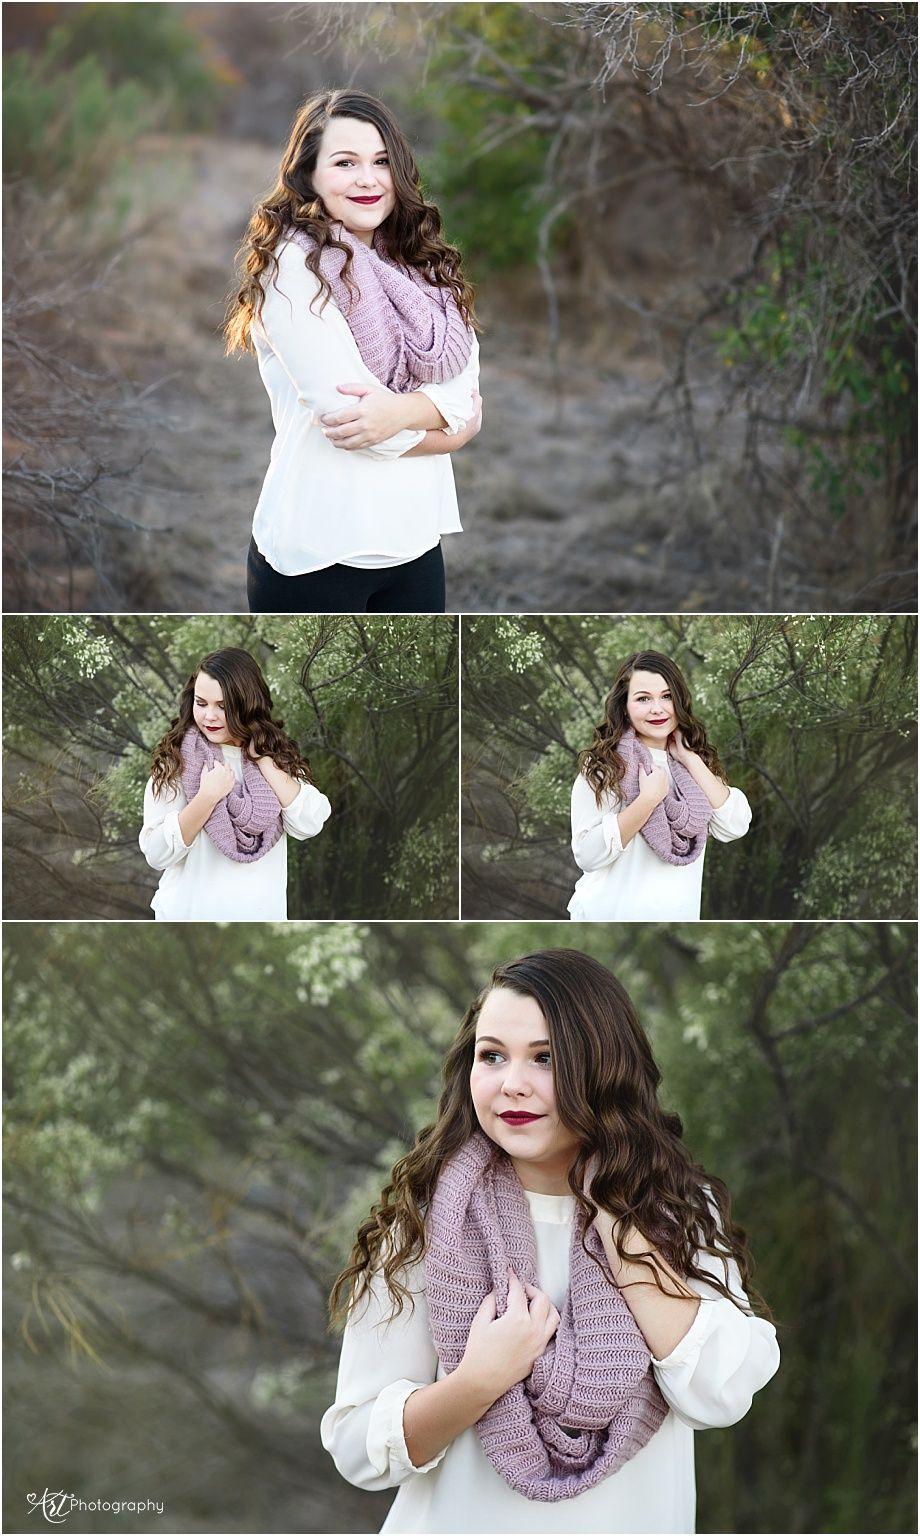 Fall Senior Photos Portrait girl, Photo ideas girl, Girl